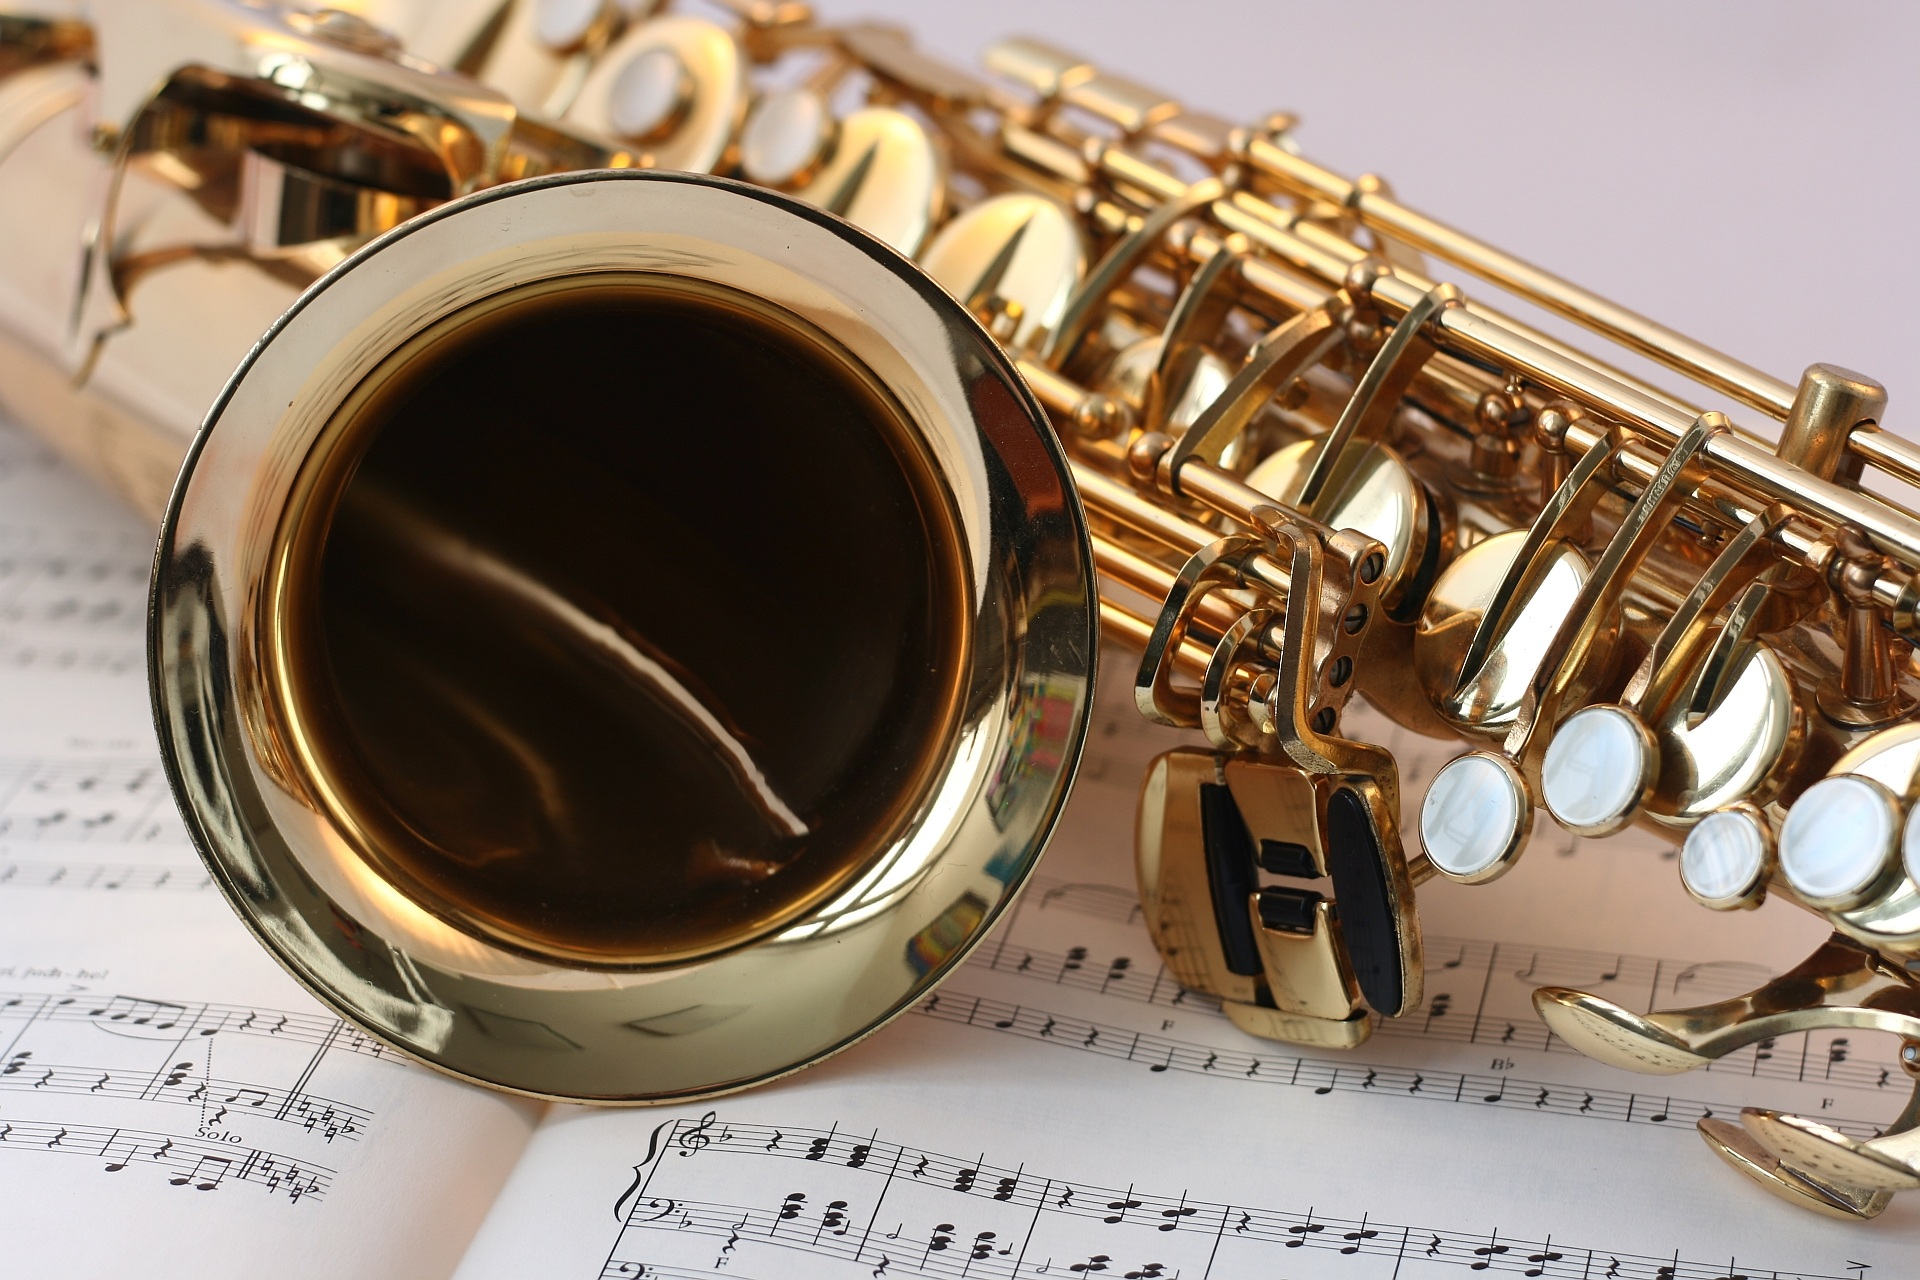 saxophone-music-gold-gloss-45243